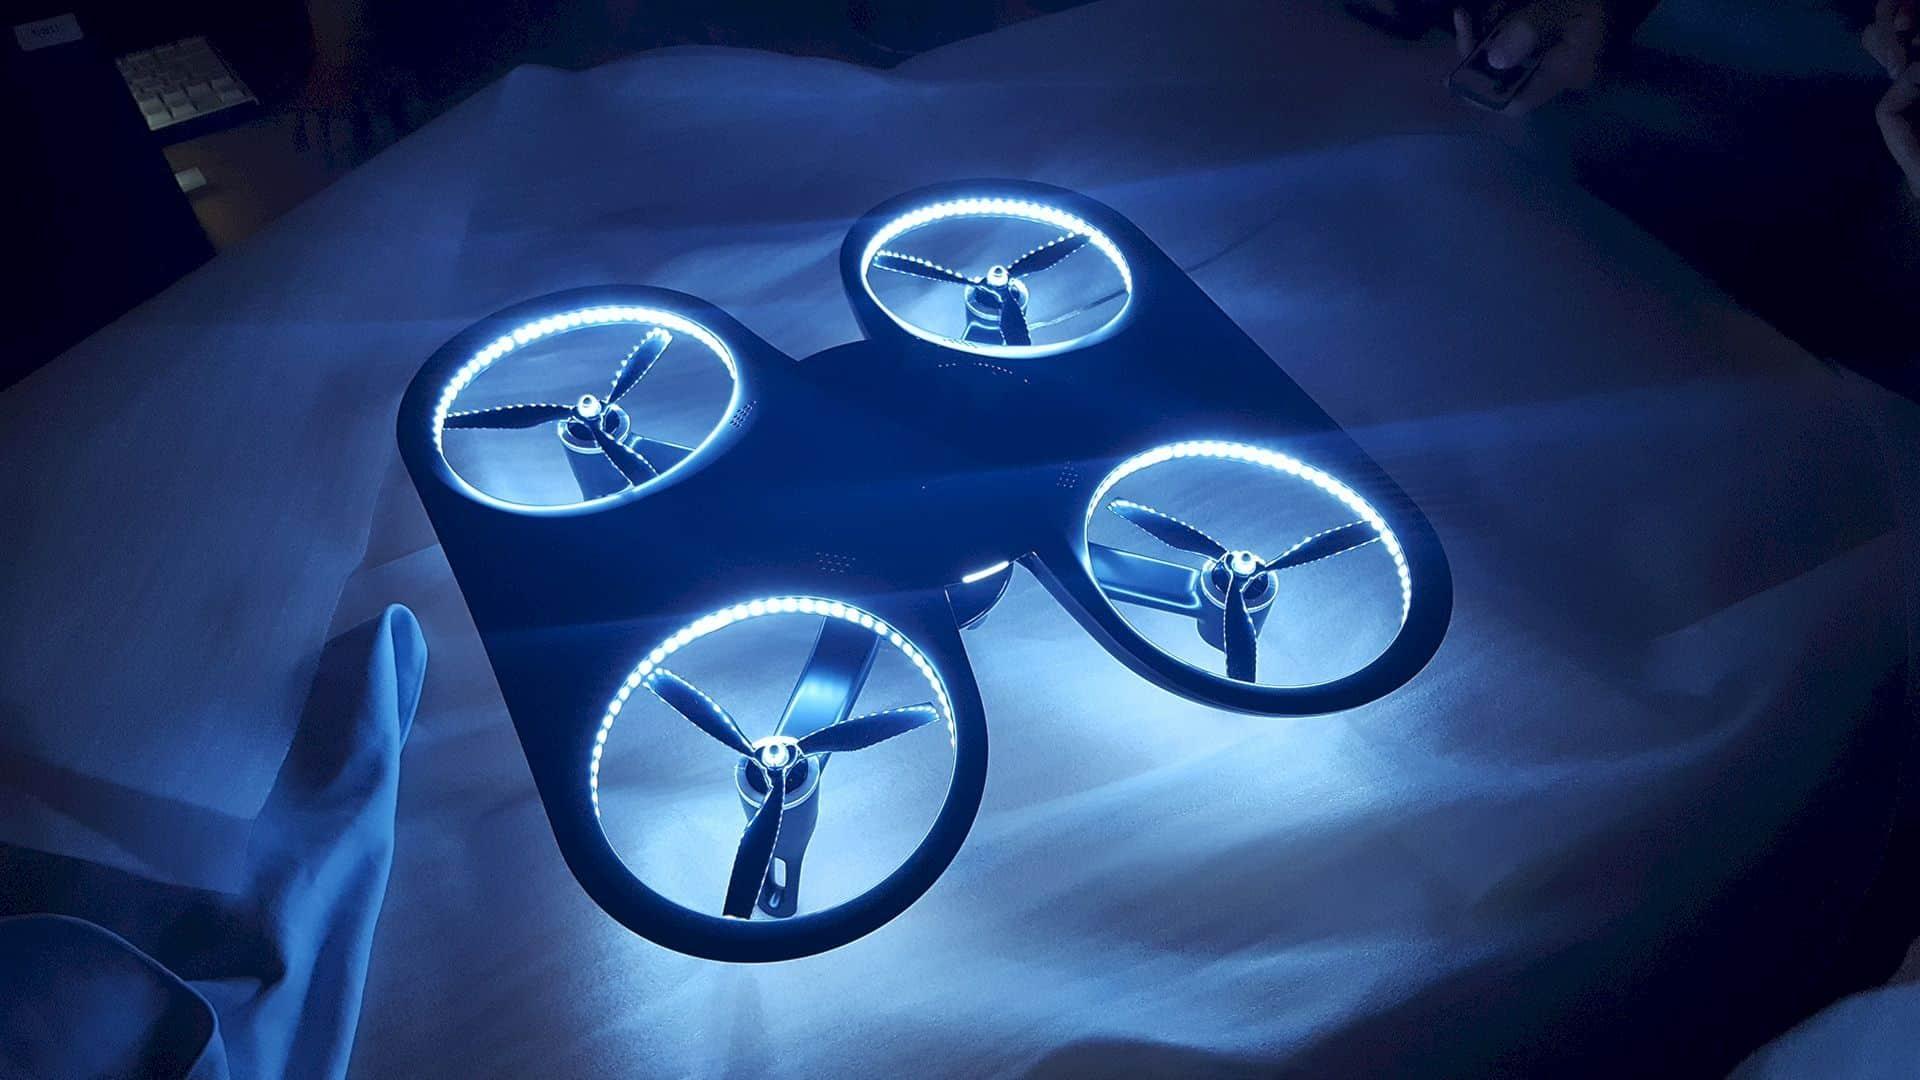 DNDN A Public Drone Safety Escort Service 8